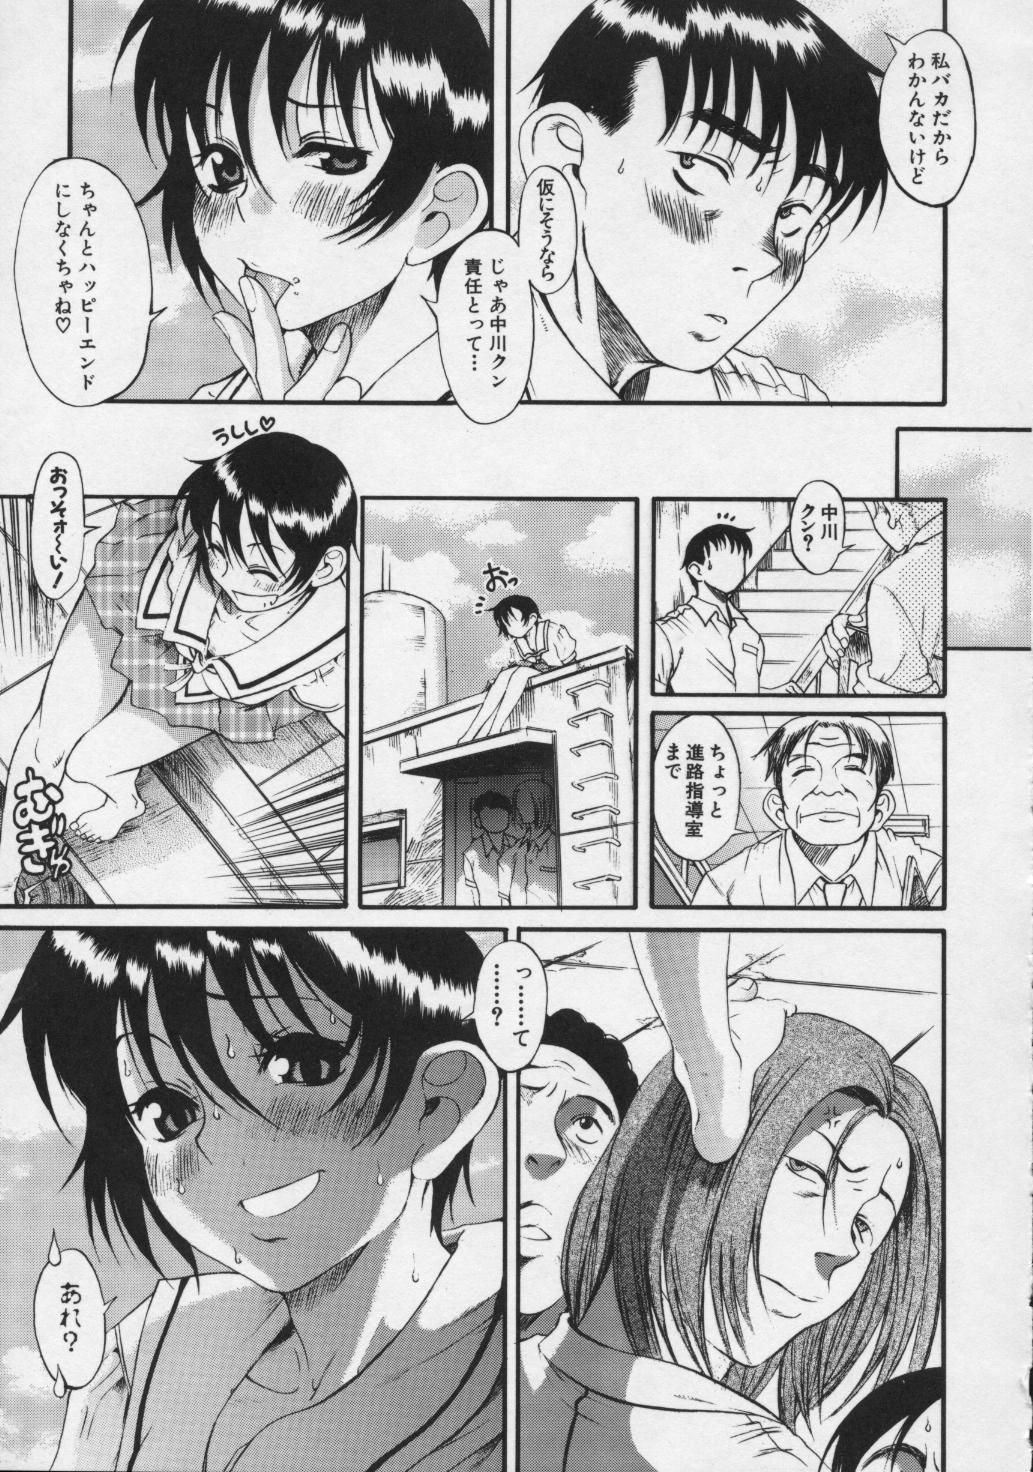 Kimi no Na o Yobeba - If I call your name. 66